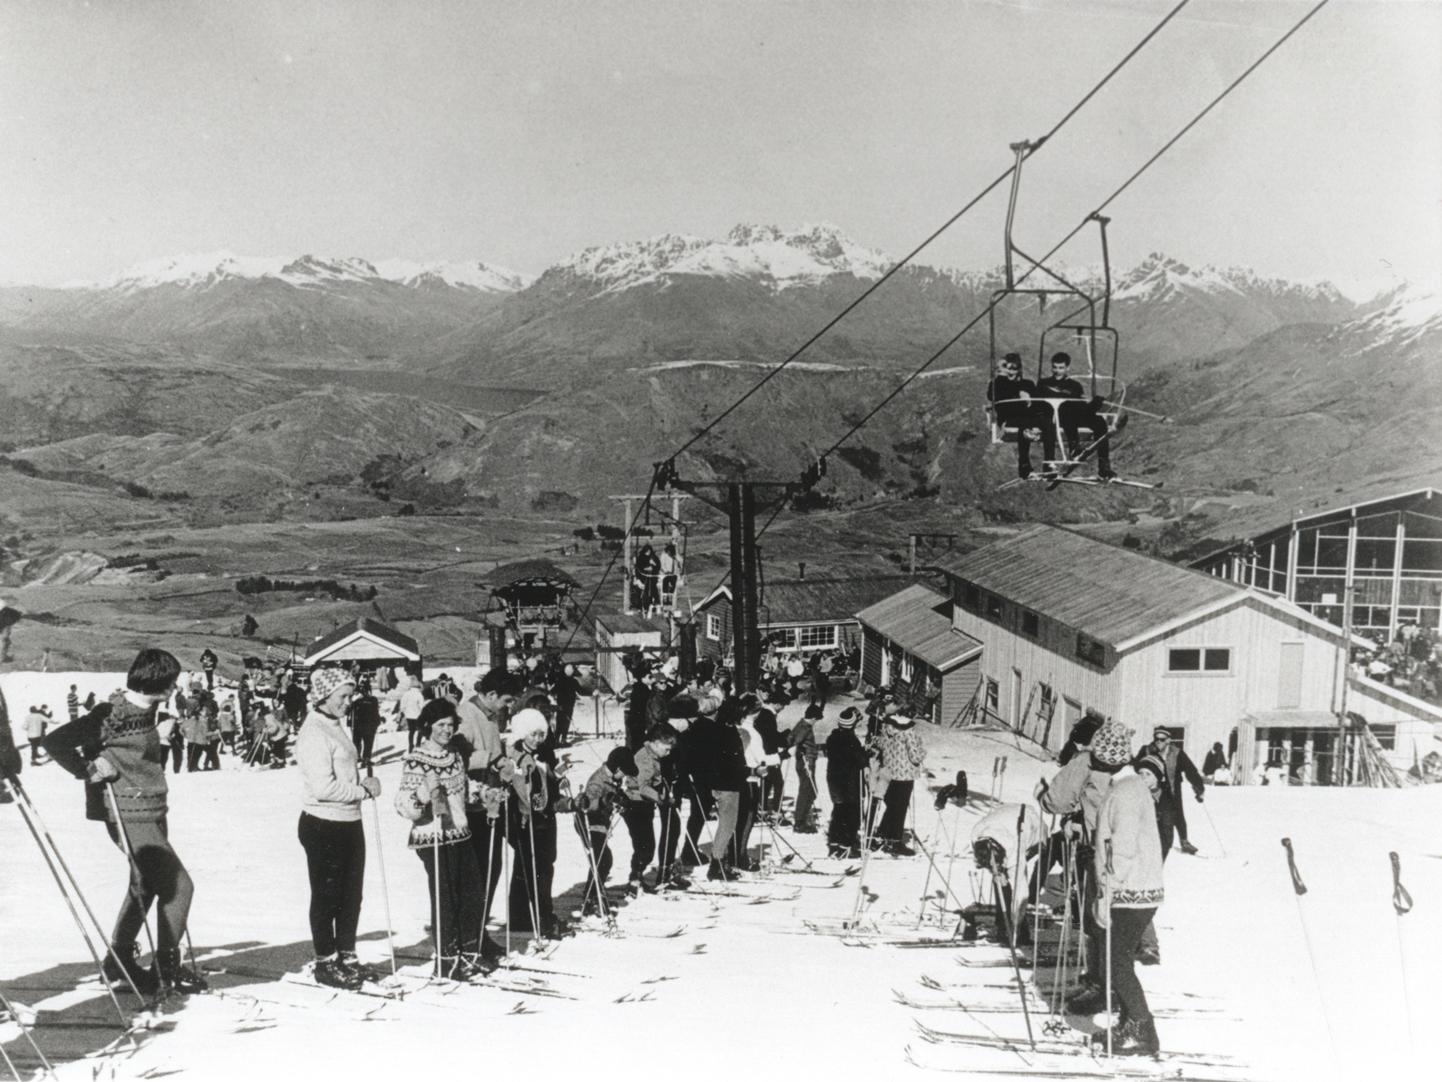 CORONET PEAK IN THE 1960'S